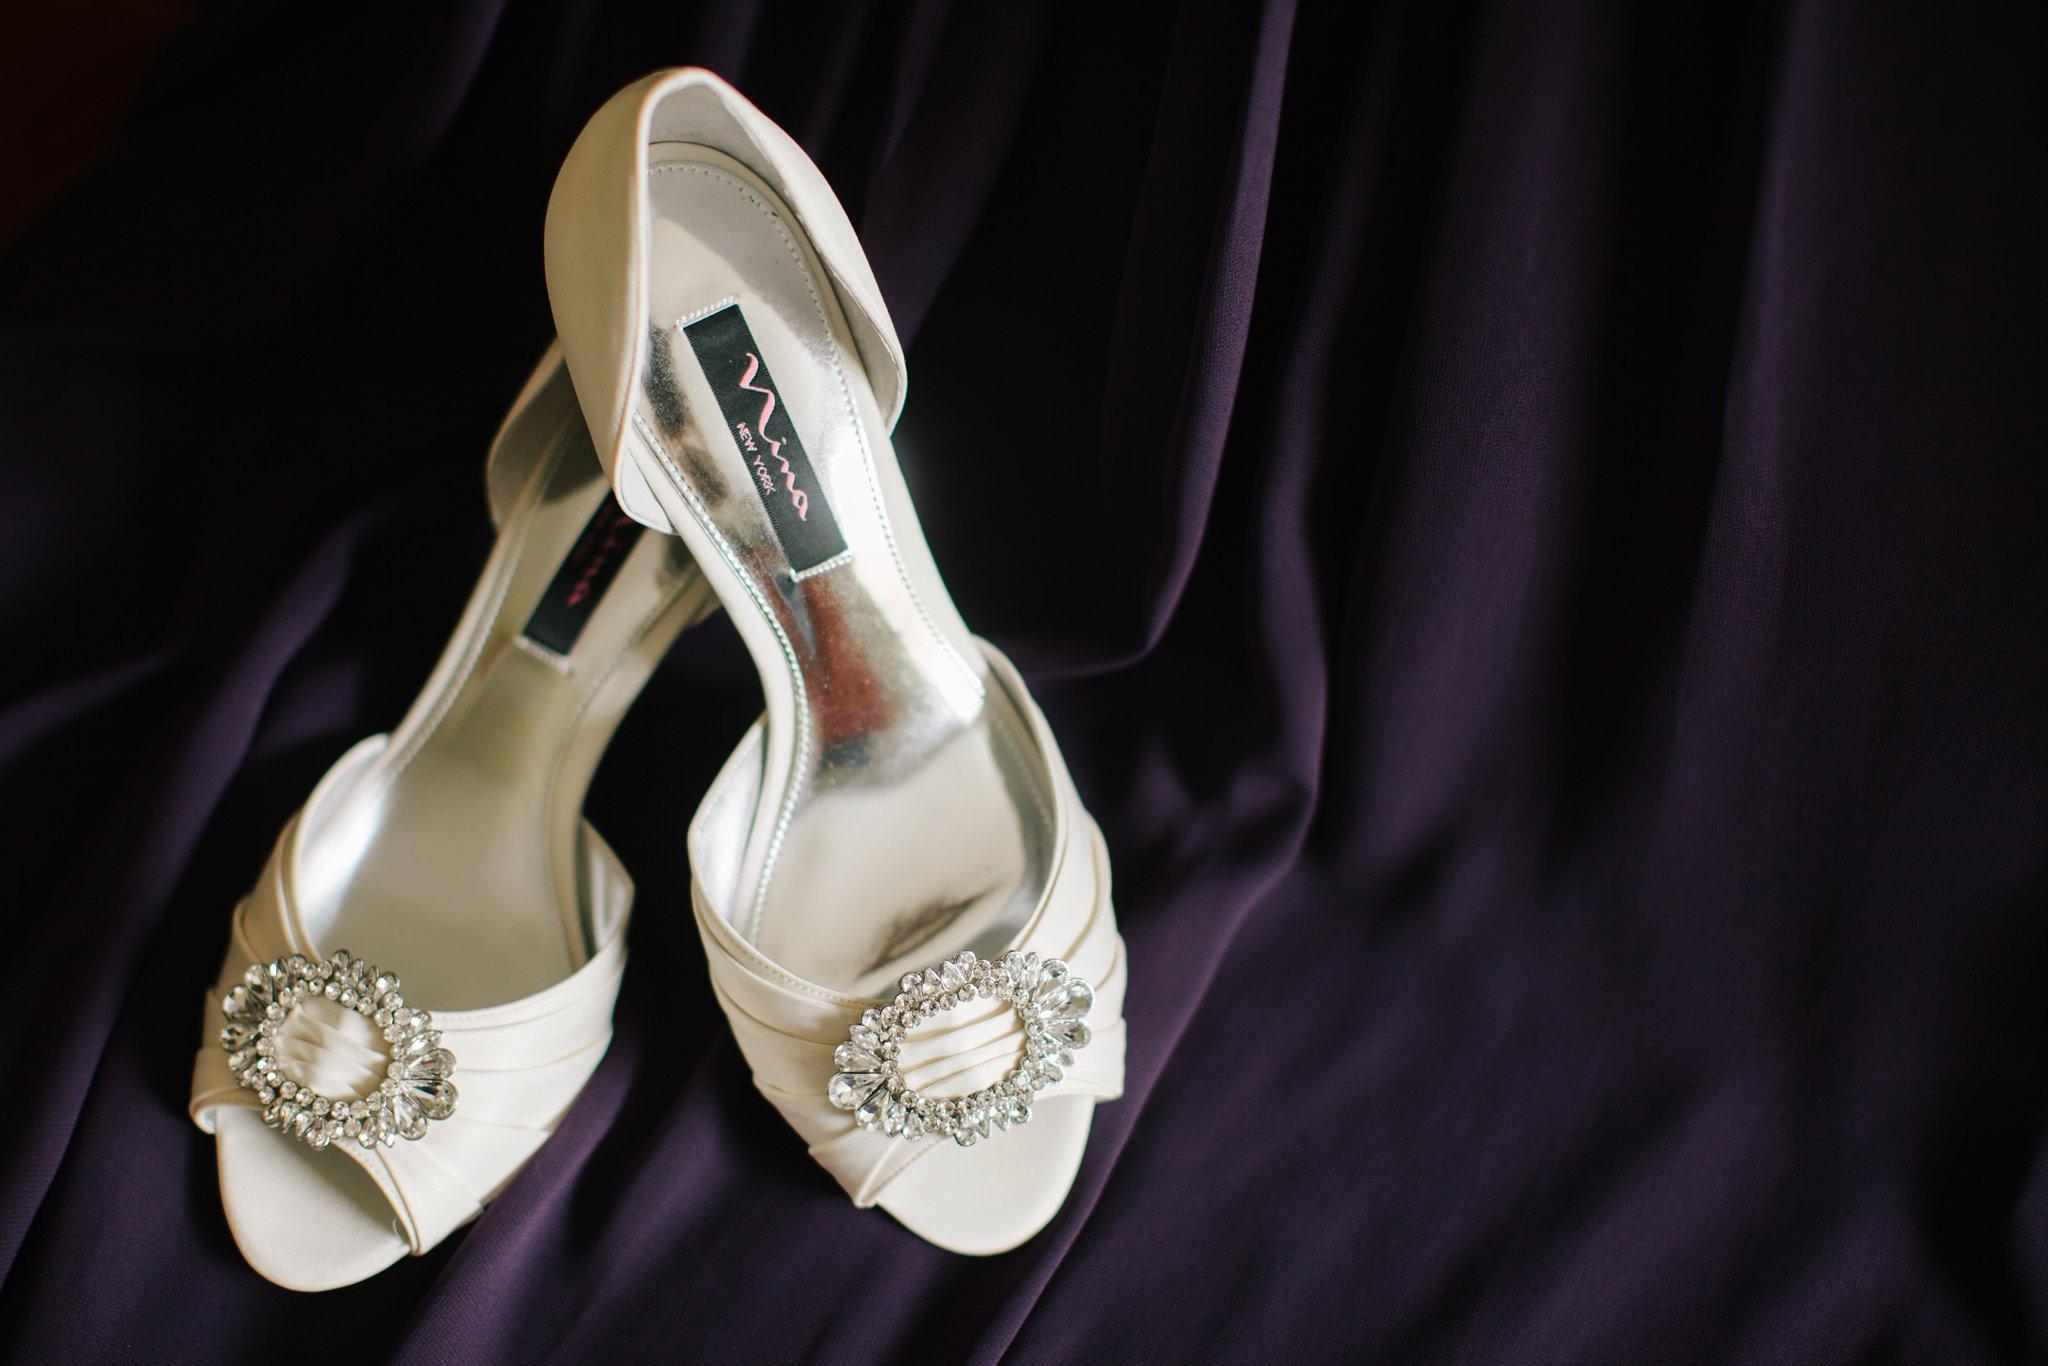 montdale_country_club_wedding_photos_photographer_scranton_pa5955.jpg